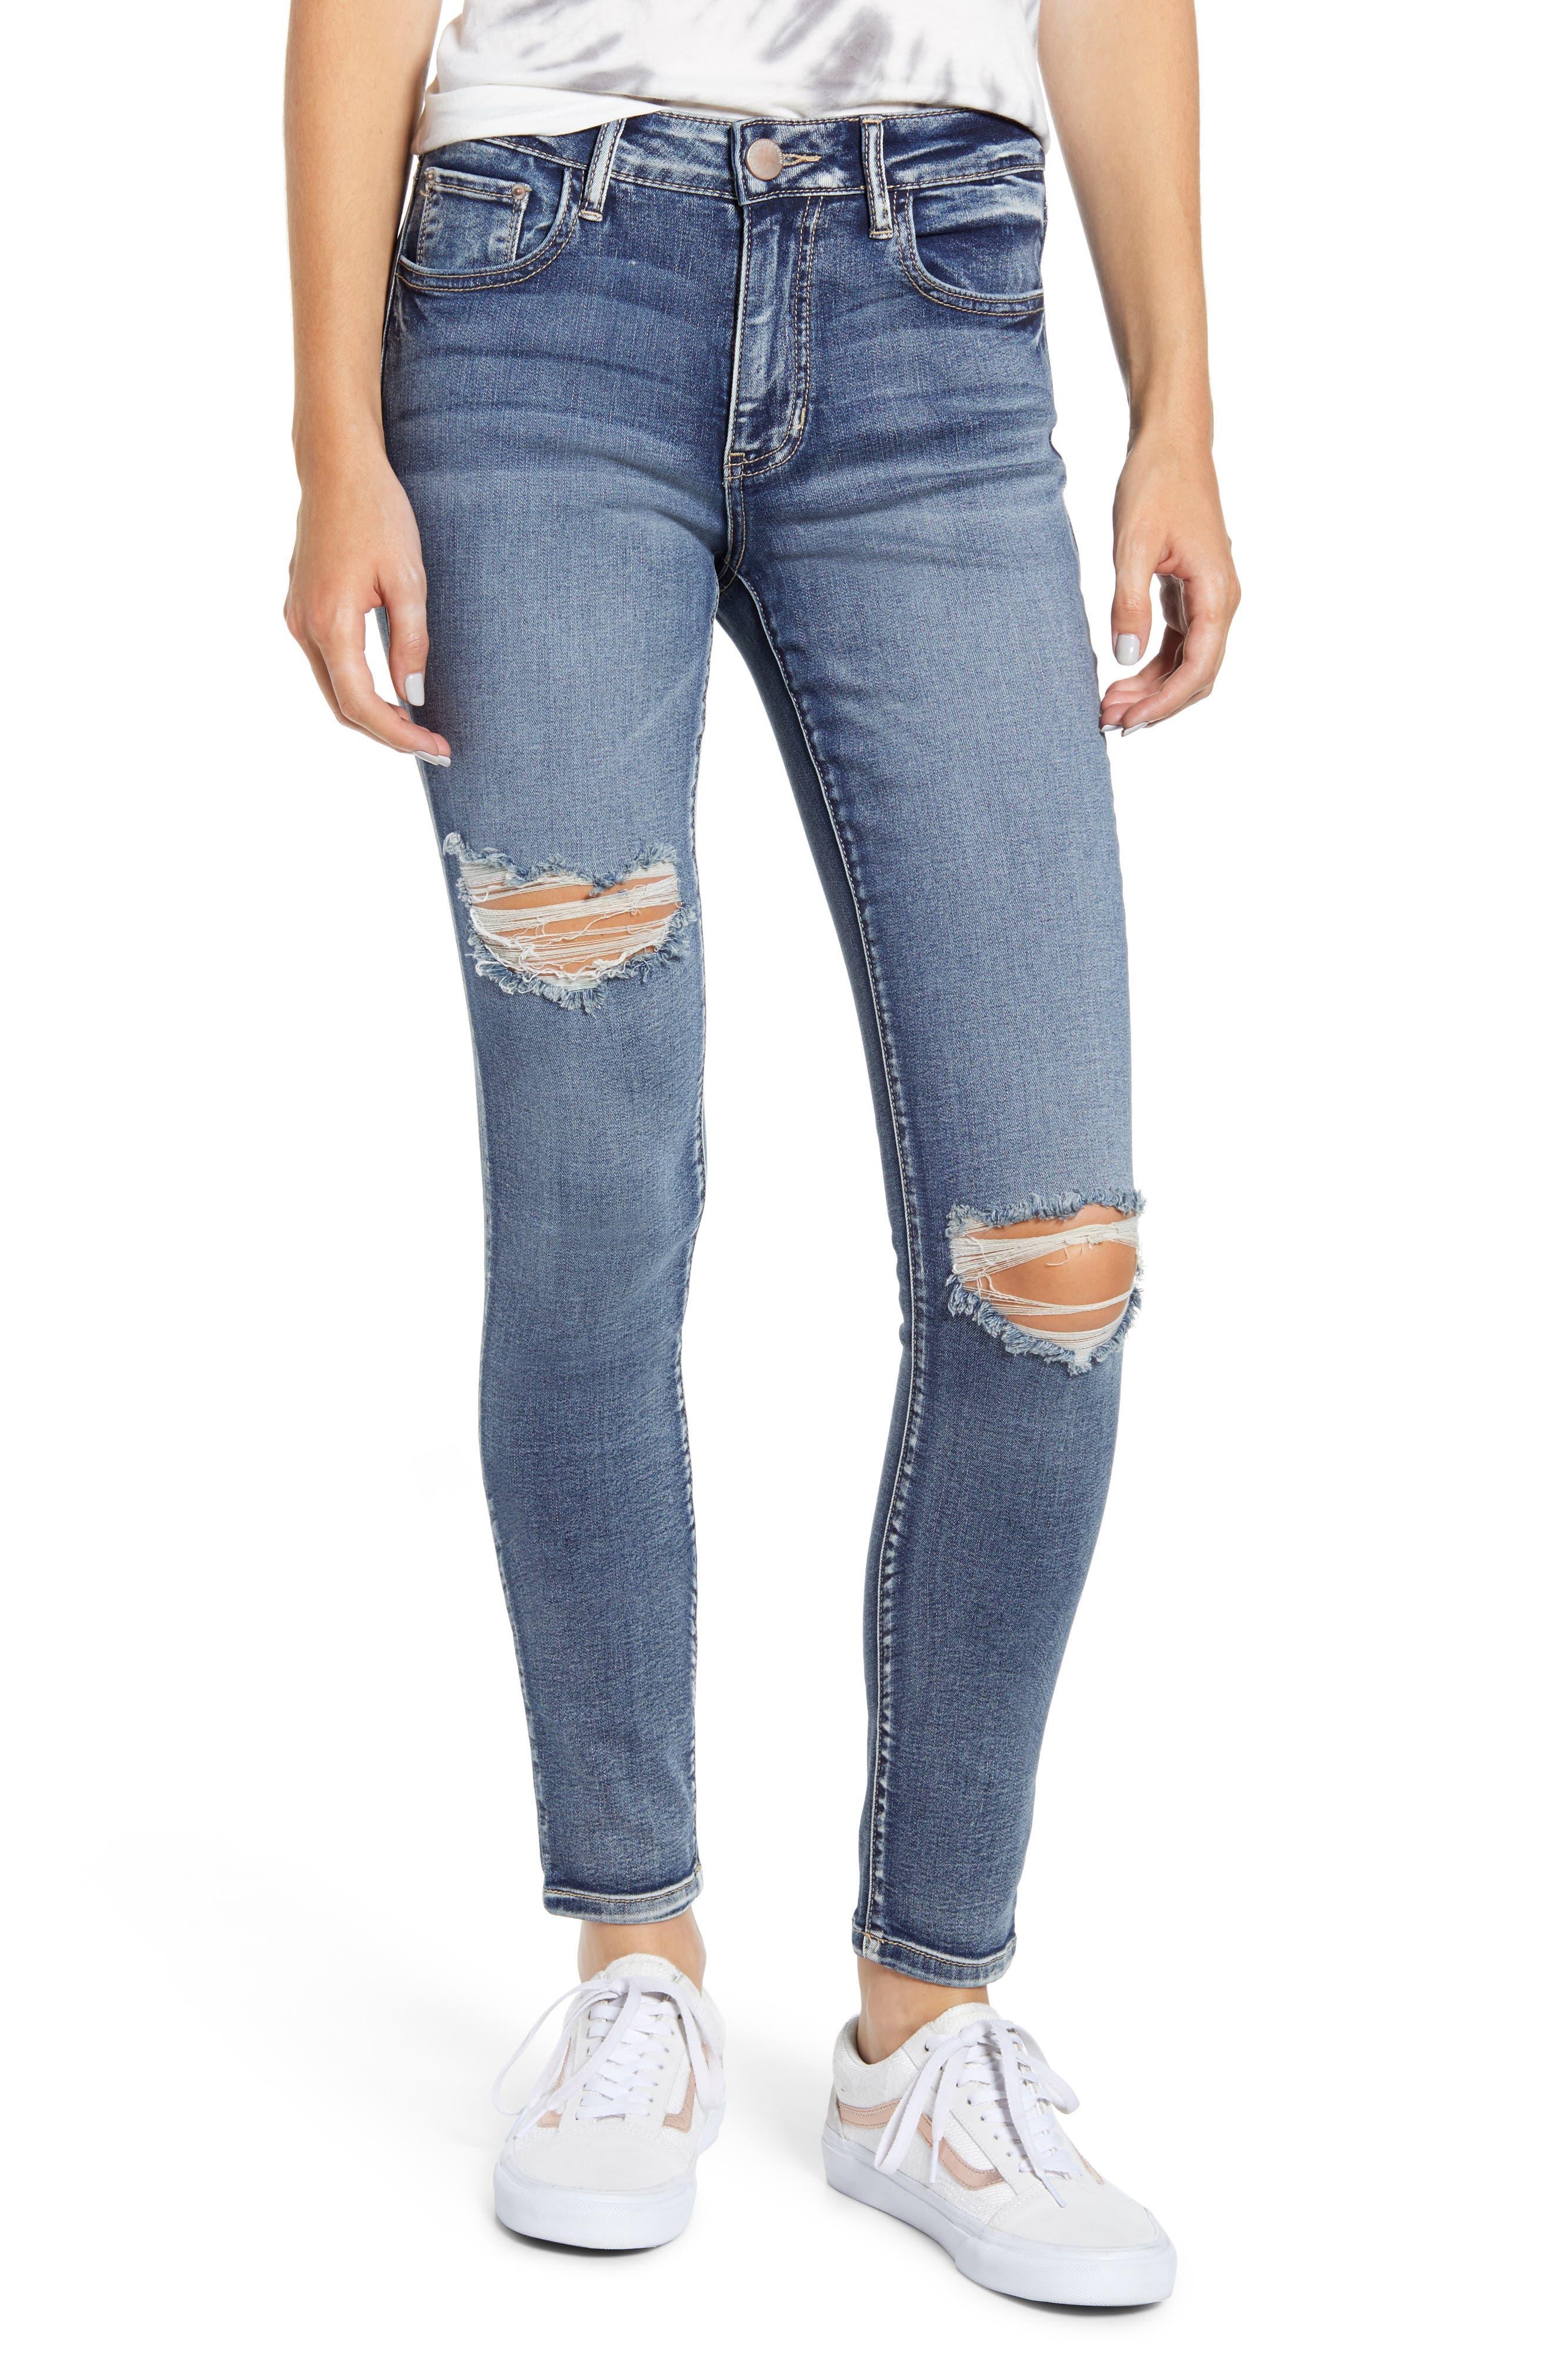 Prosperity Denim Ripped Skinny Jeans (Boyfriend)